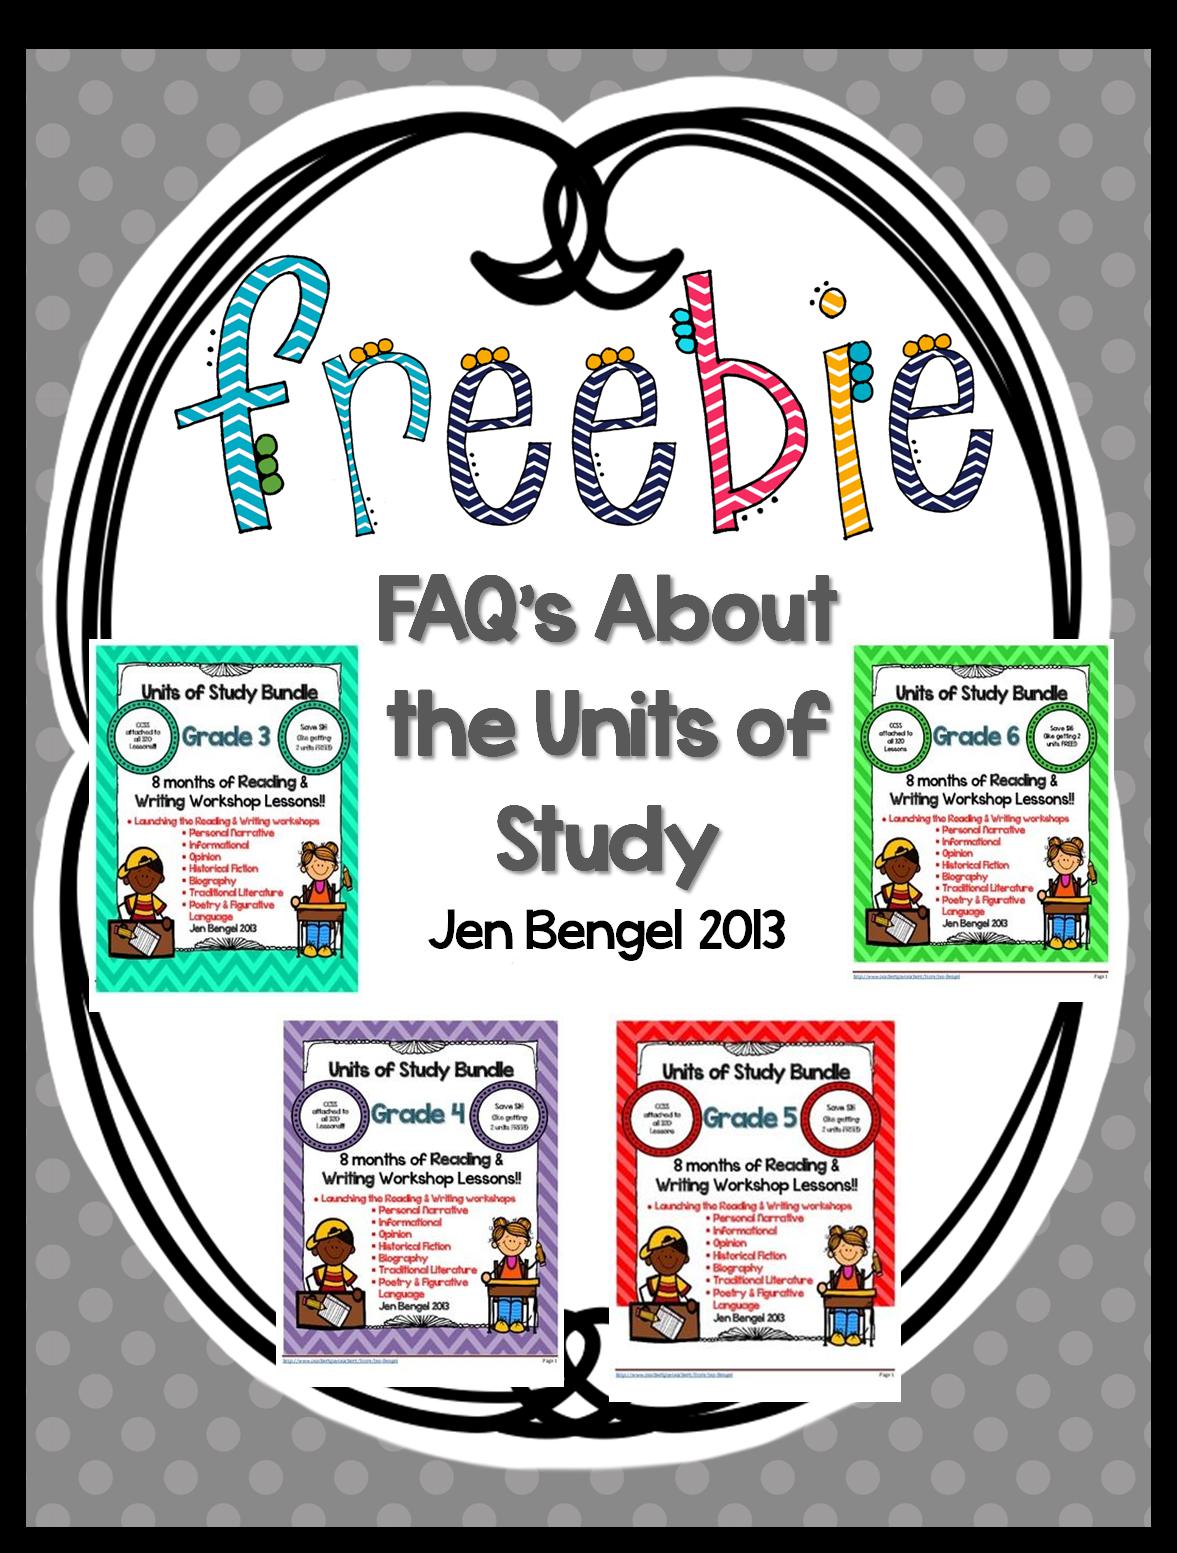 http://www.teacherspayteachers.com/Product/FAQs-About-the-Units-of-Study-Freebie-816559